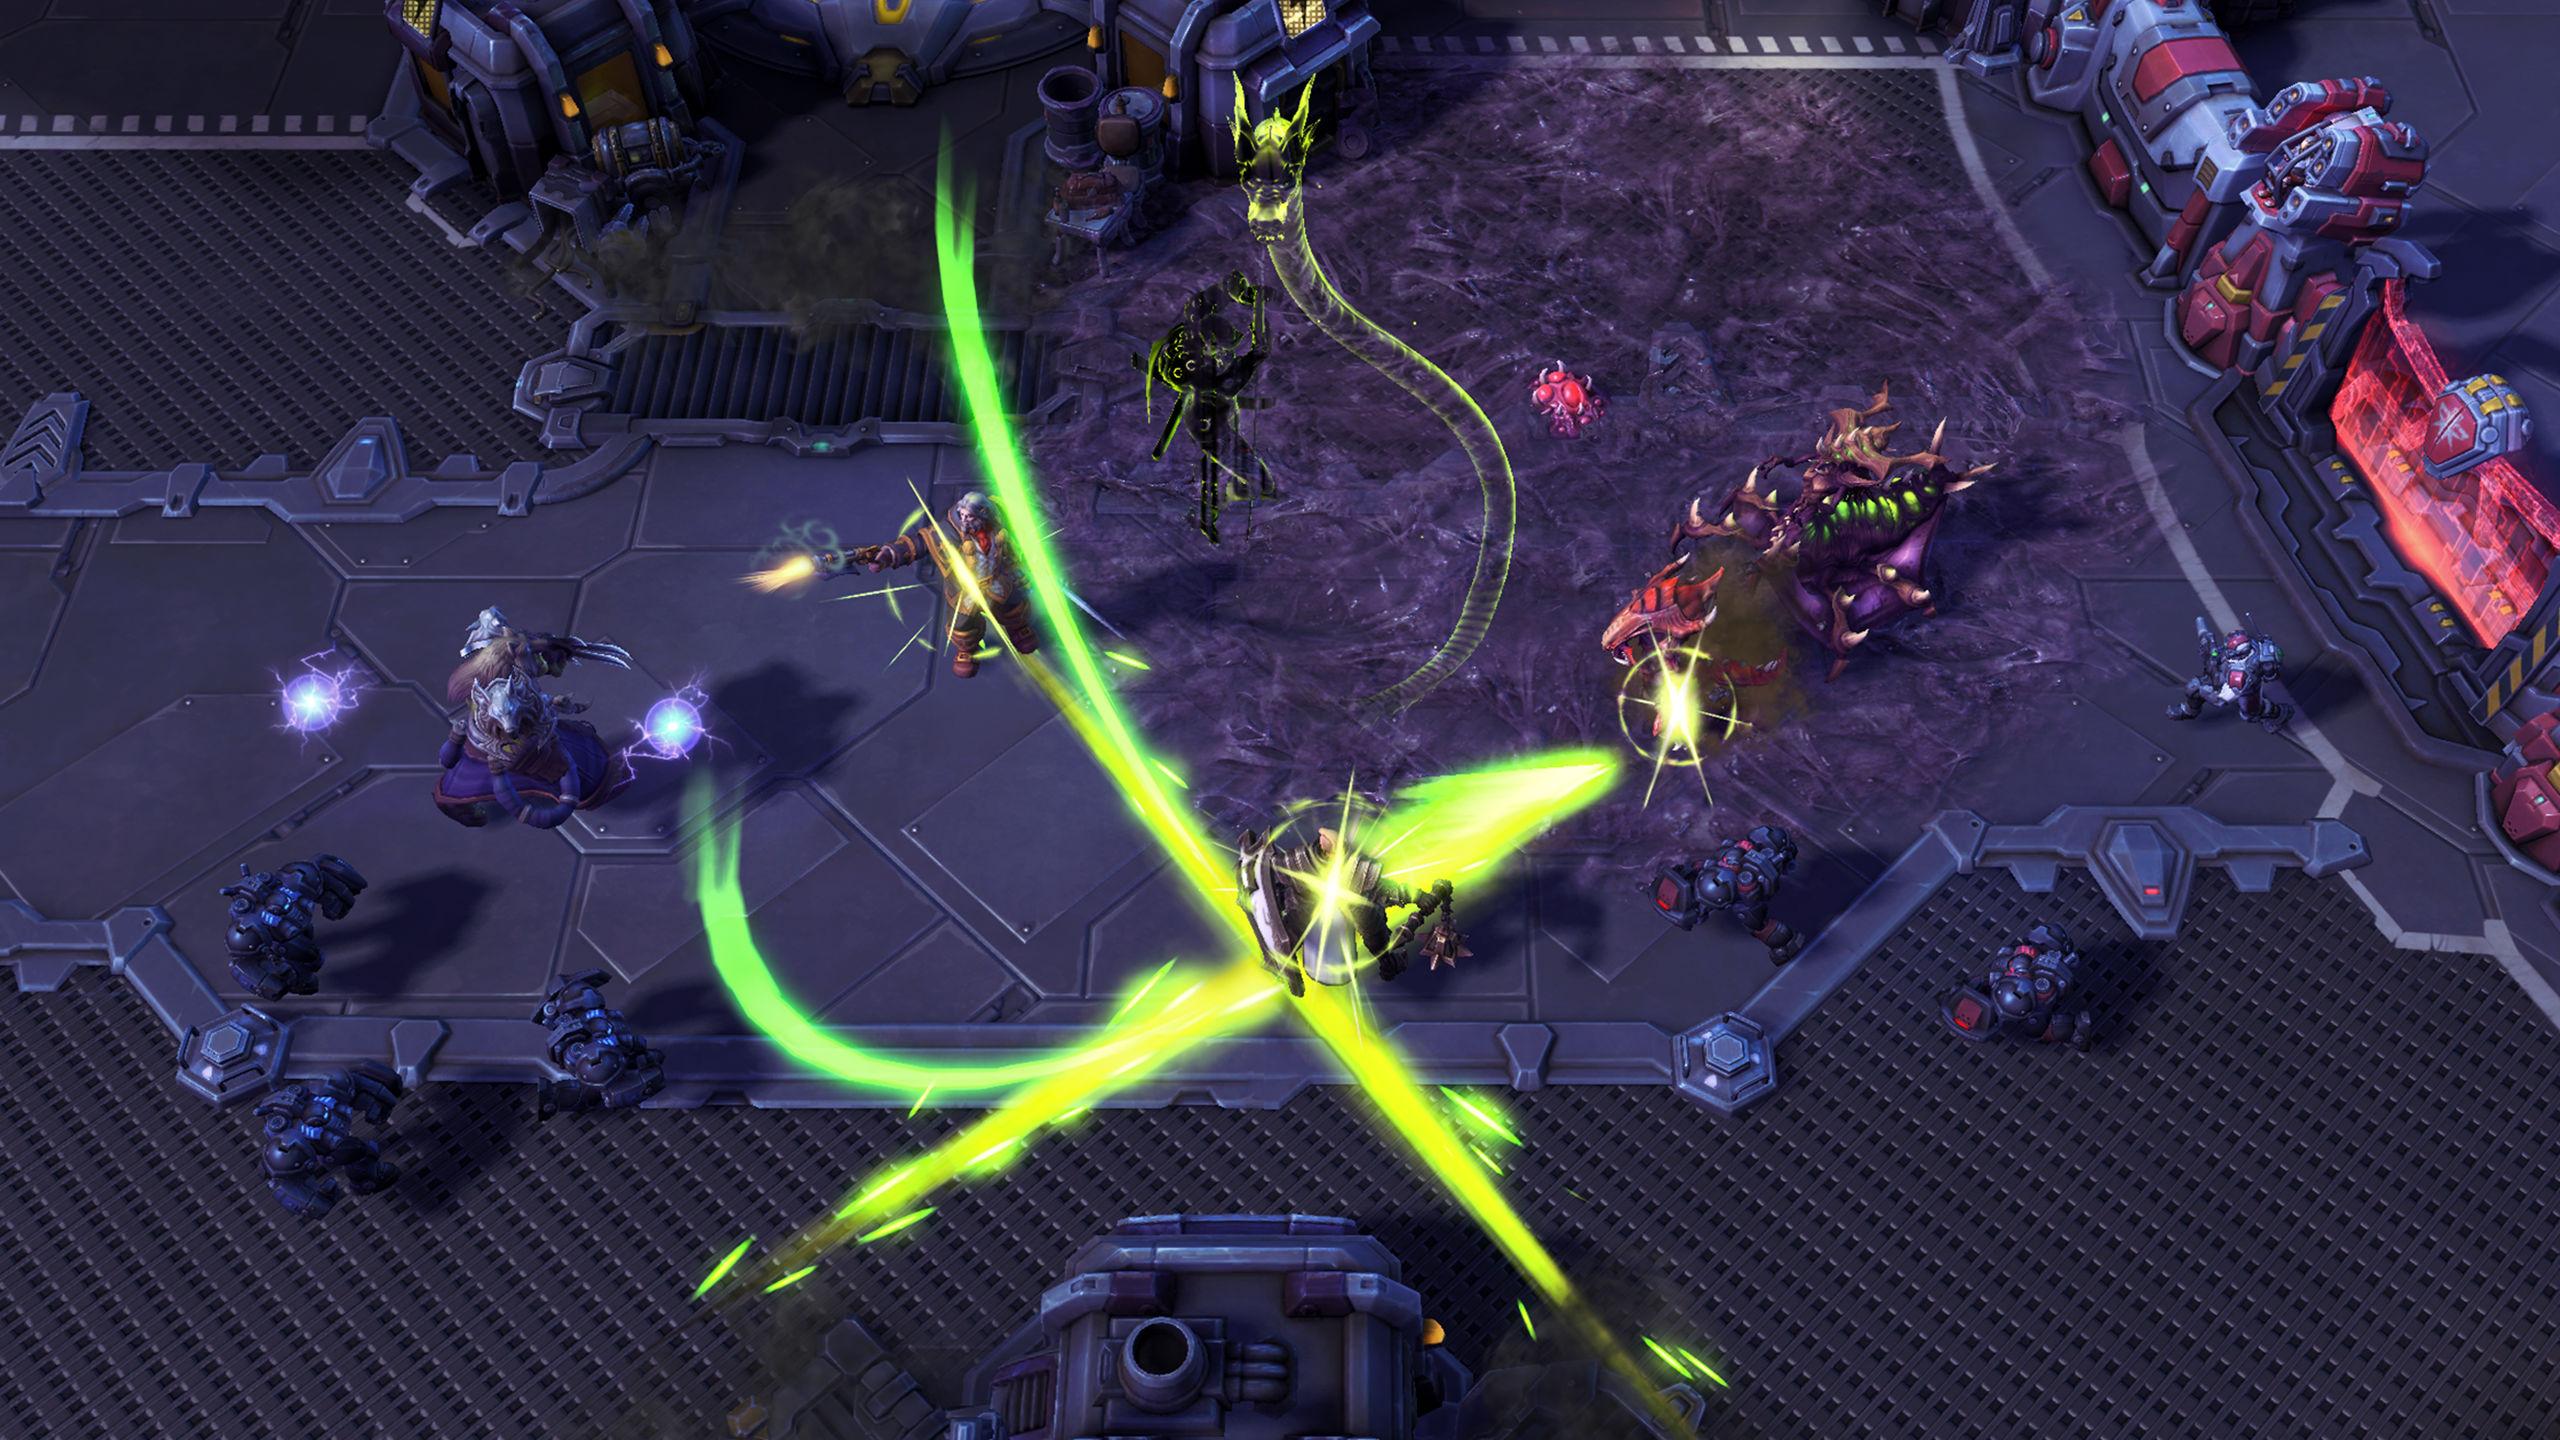 Overwatch's Genji and Hanamura are coming to Heroes of the Storm screenshot